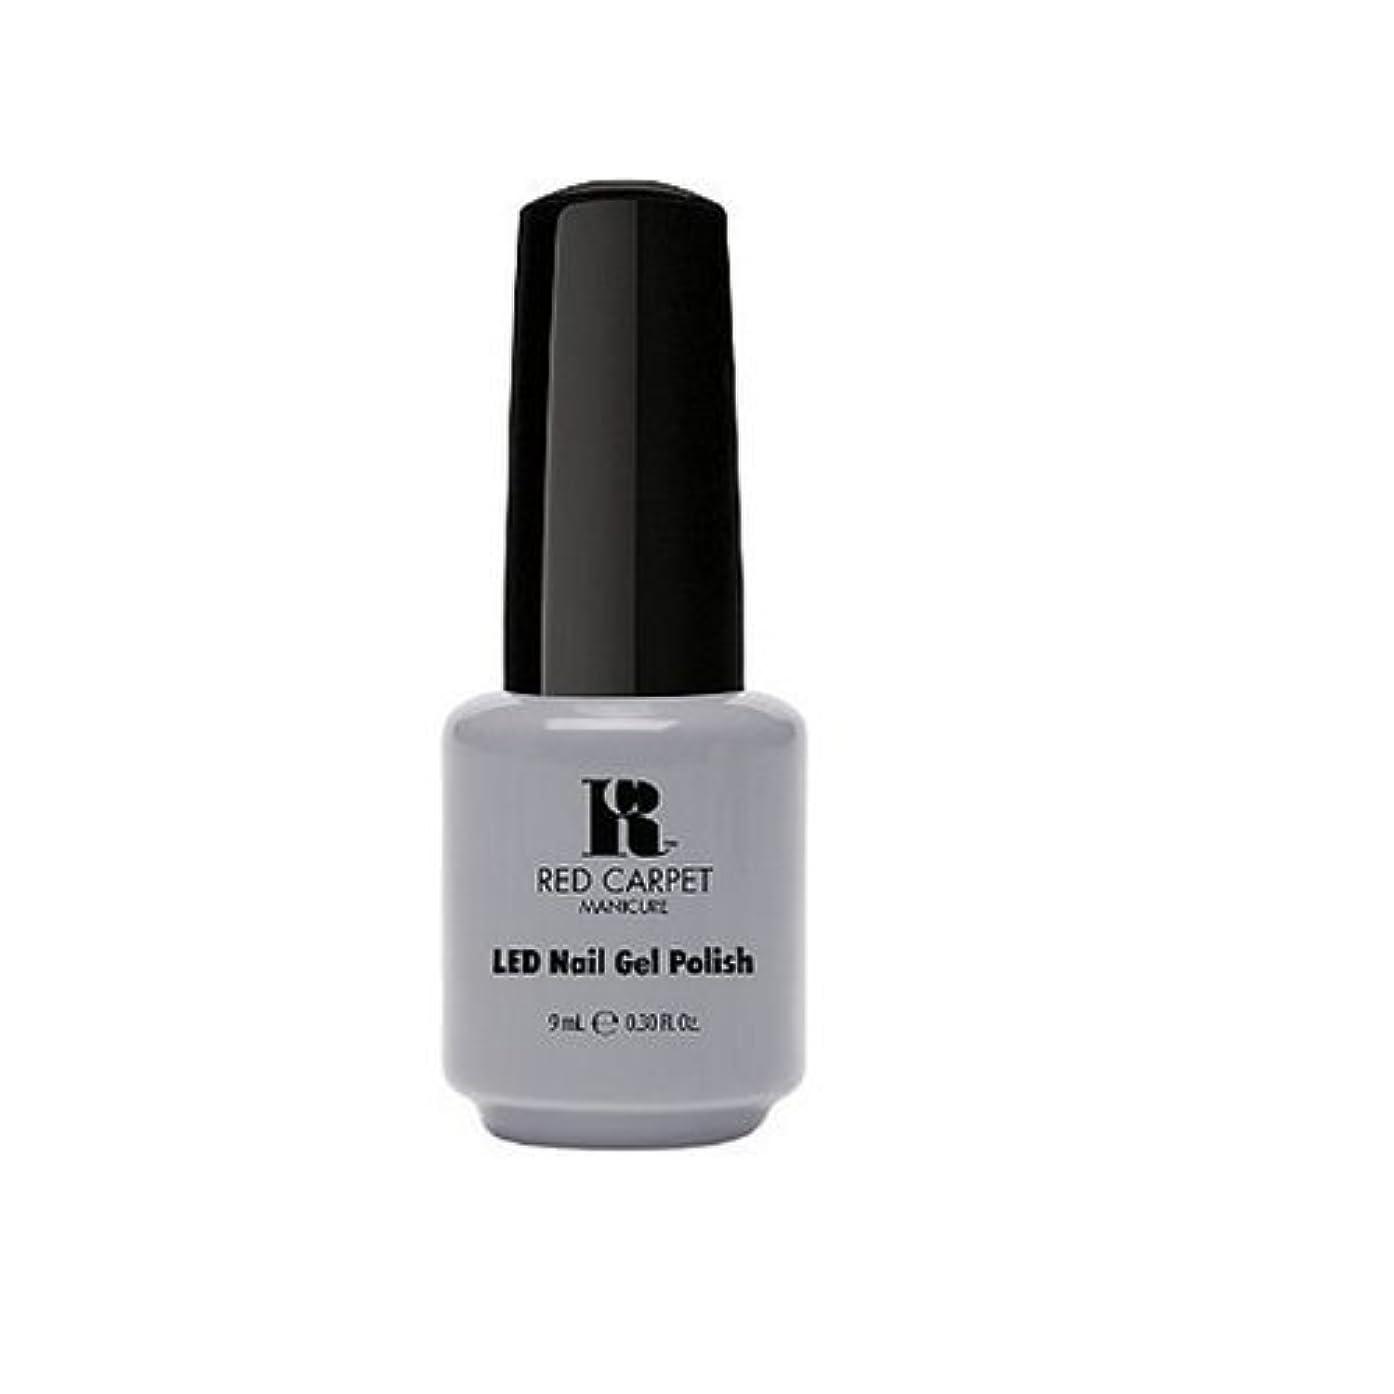 Red Carpet Manicure - LED Nail Gel Polish - #nofilter - 0.3oz / 9ml